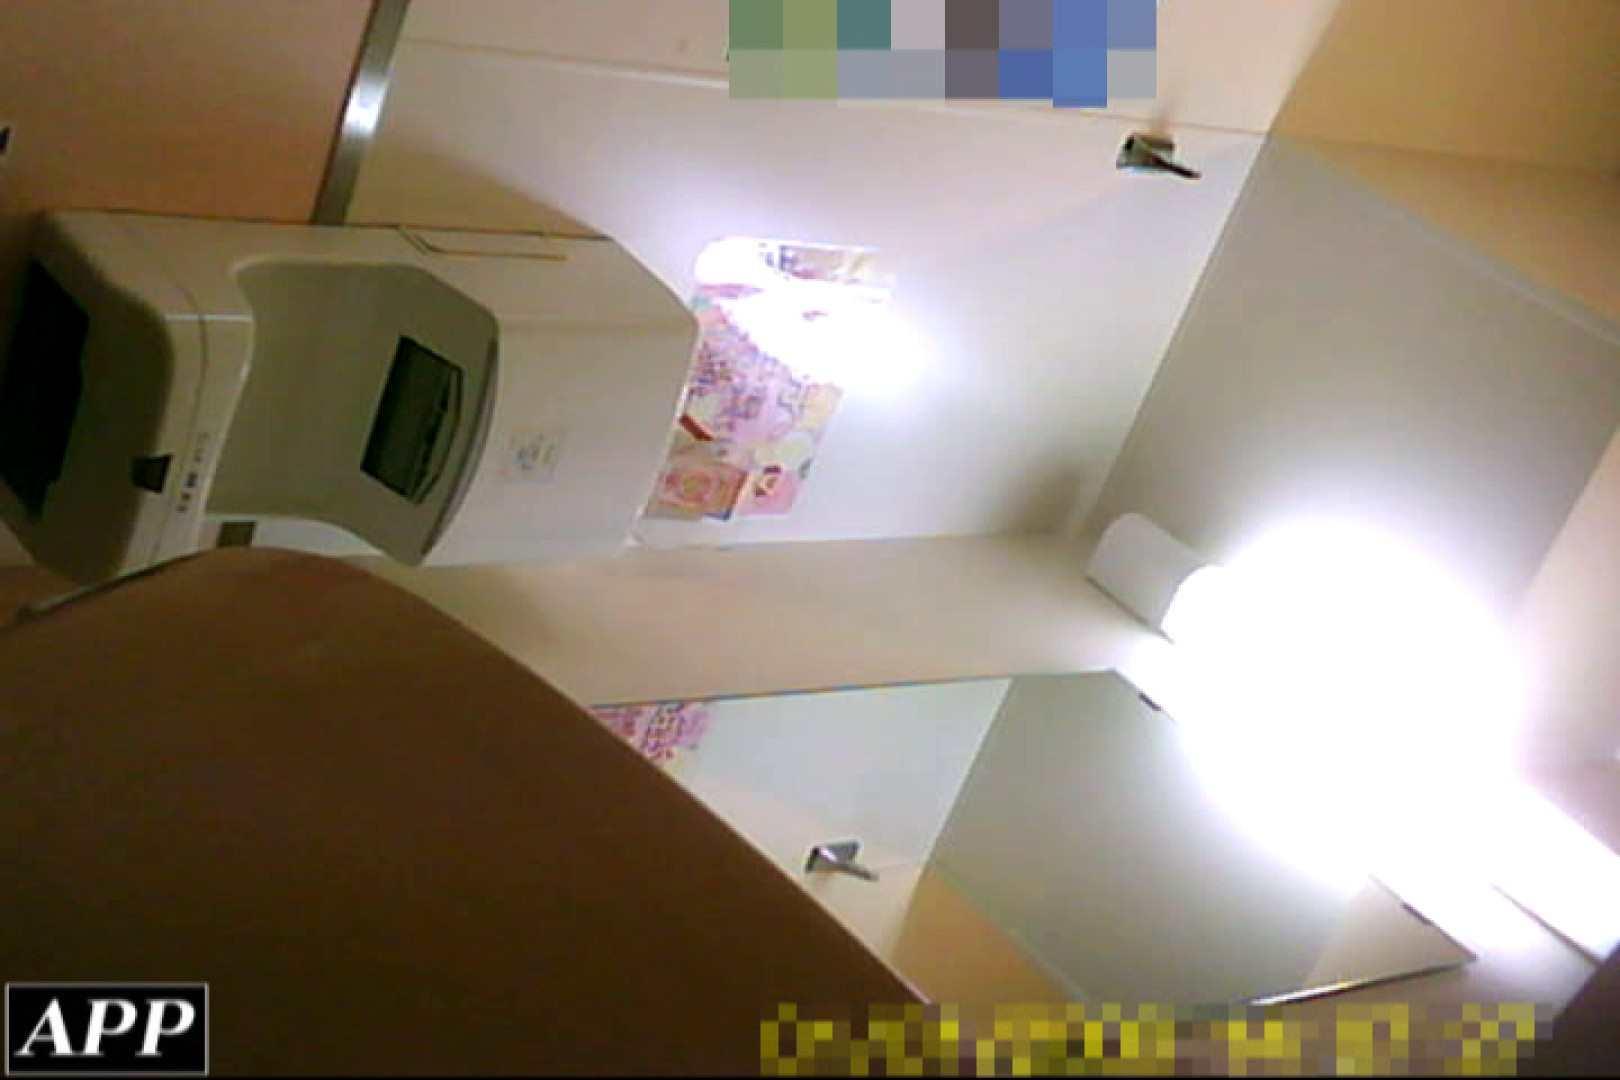 3視点洗面所 vol.053 洗面所 | OLセックス  67画像 55